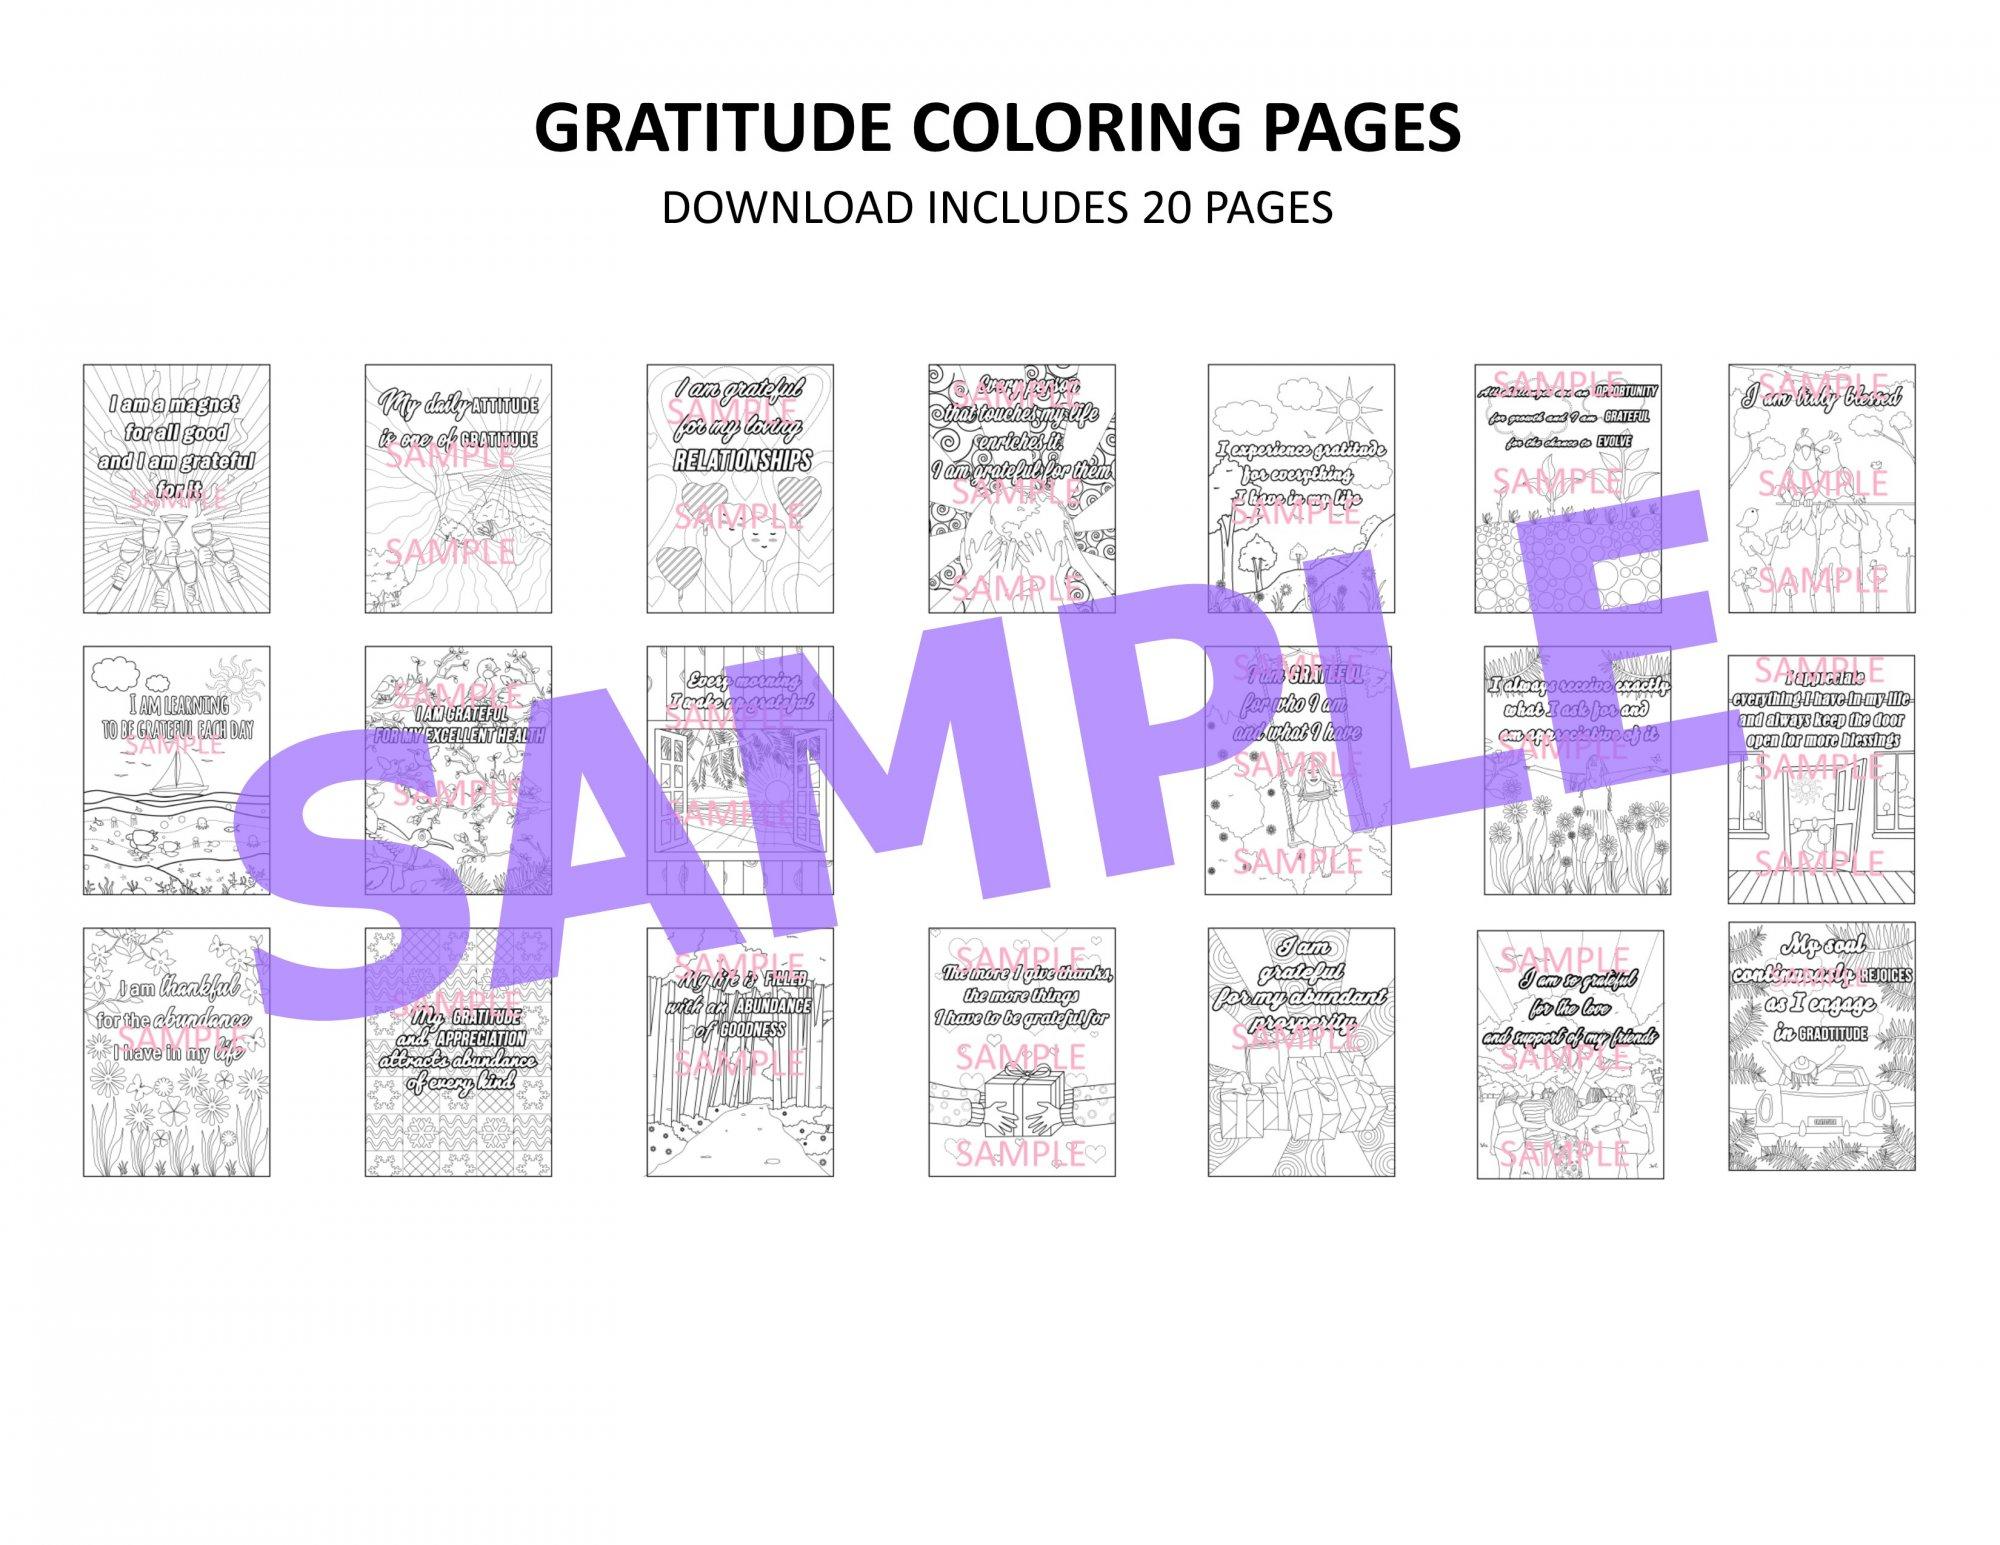 Gratitude Coloring Complete Set (20 Pages)